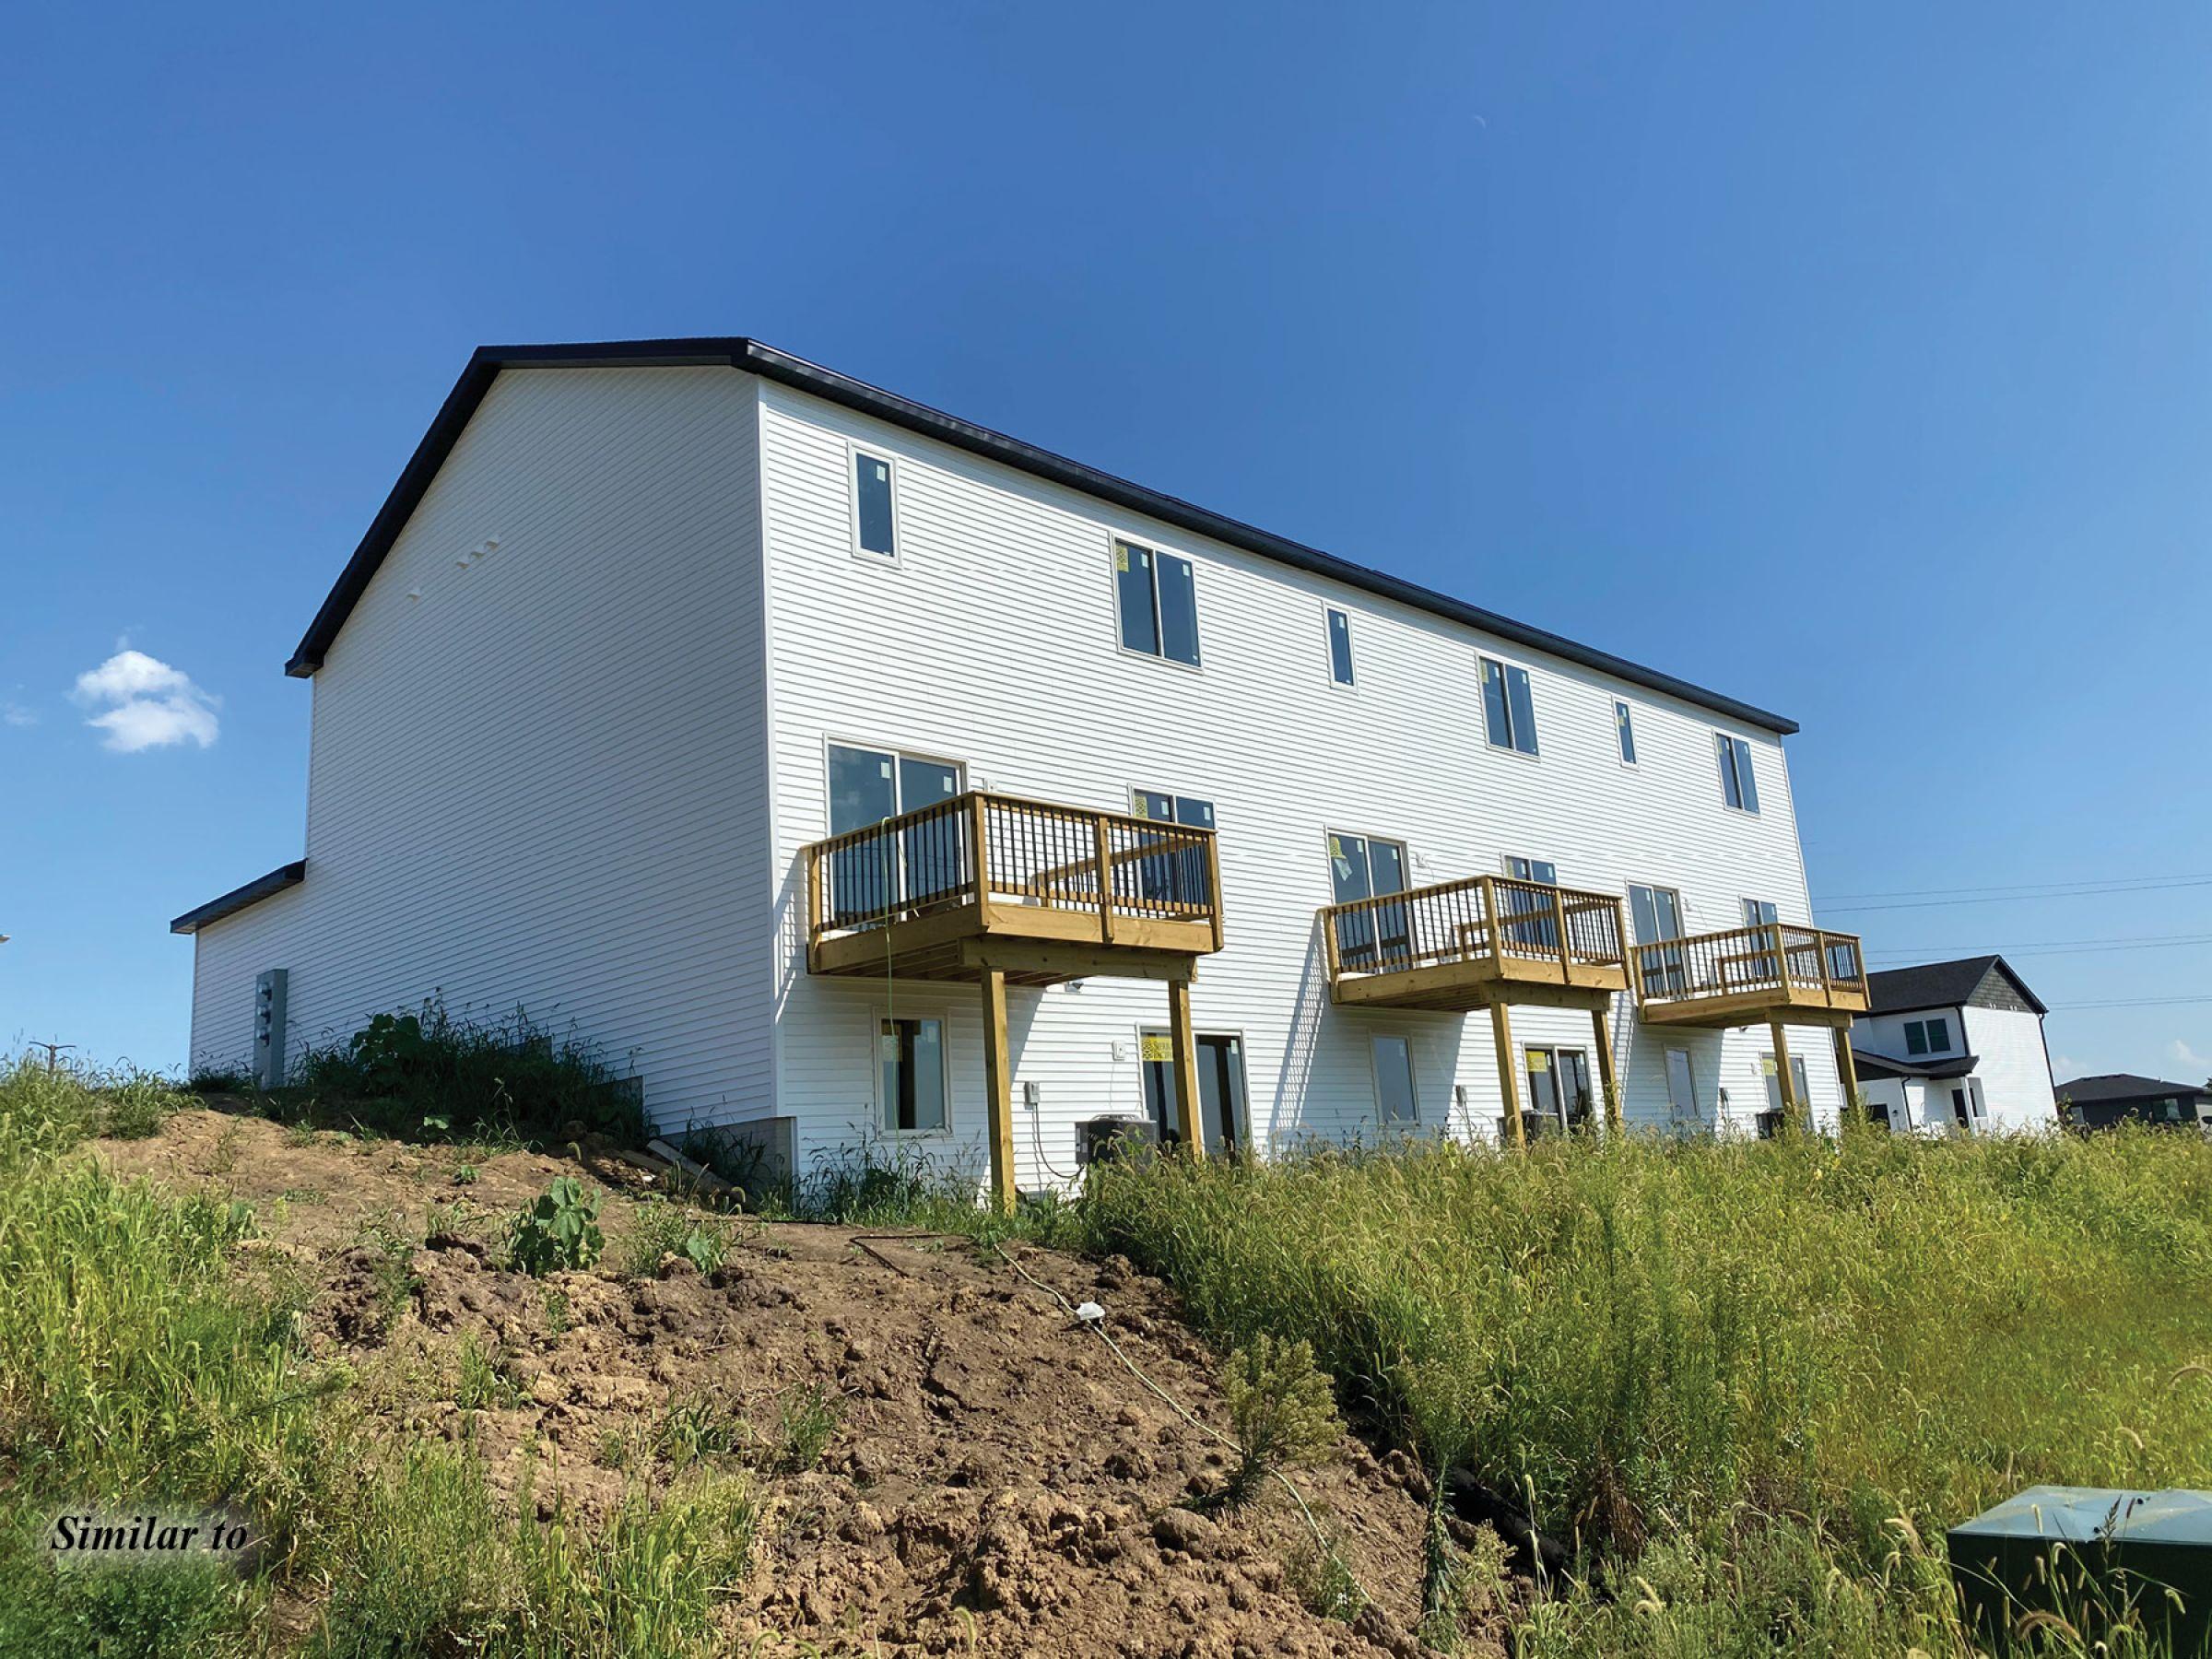 residential-warren-county-iowa-0-acres-listing-number-15676-0-2021-08-06-145131.jpg